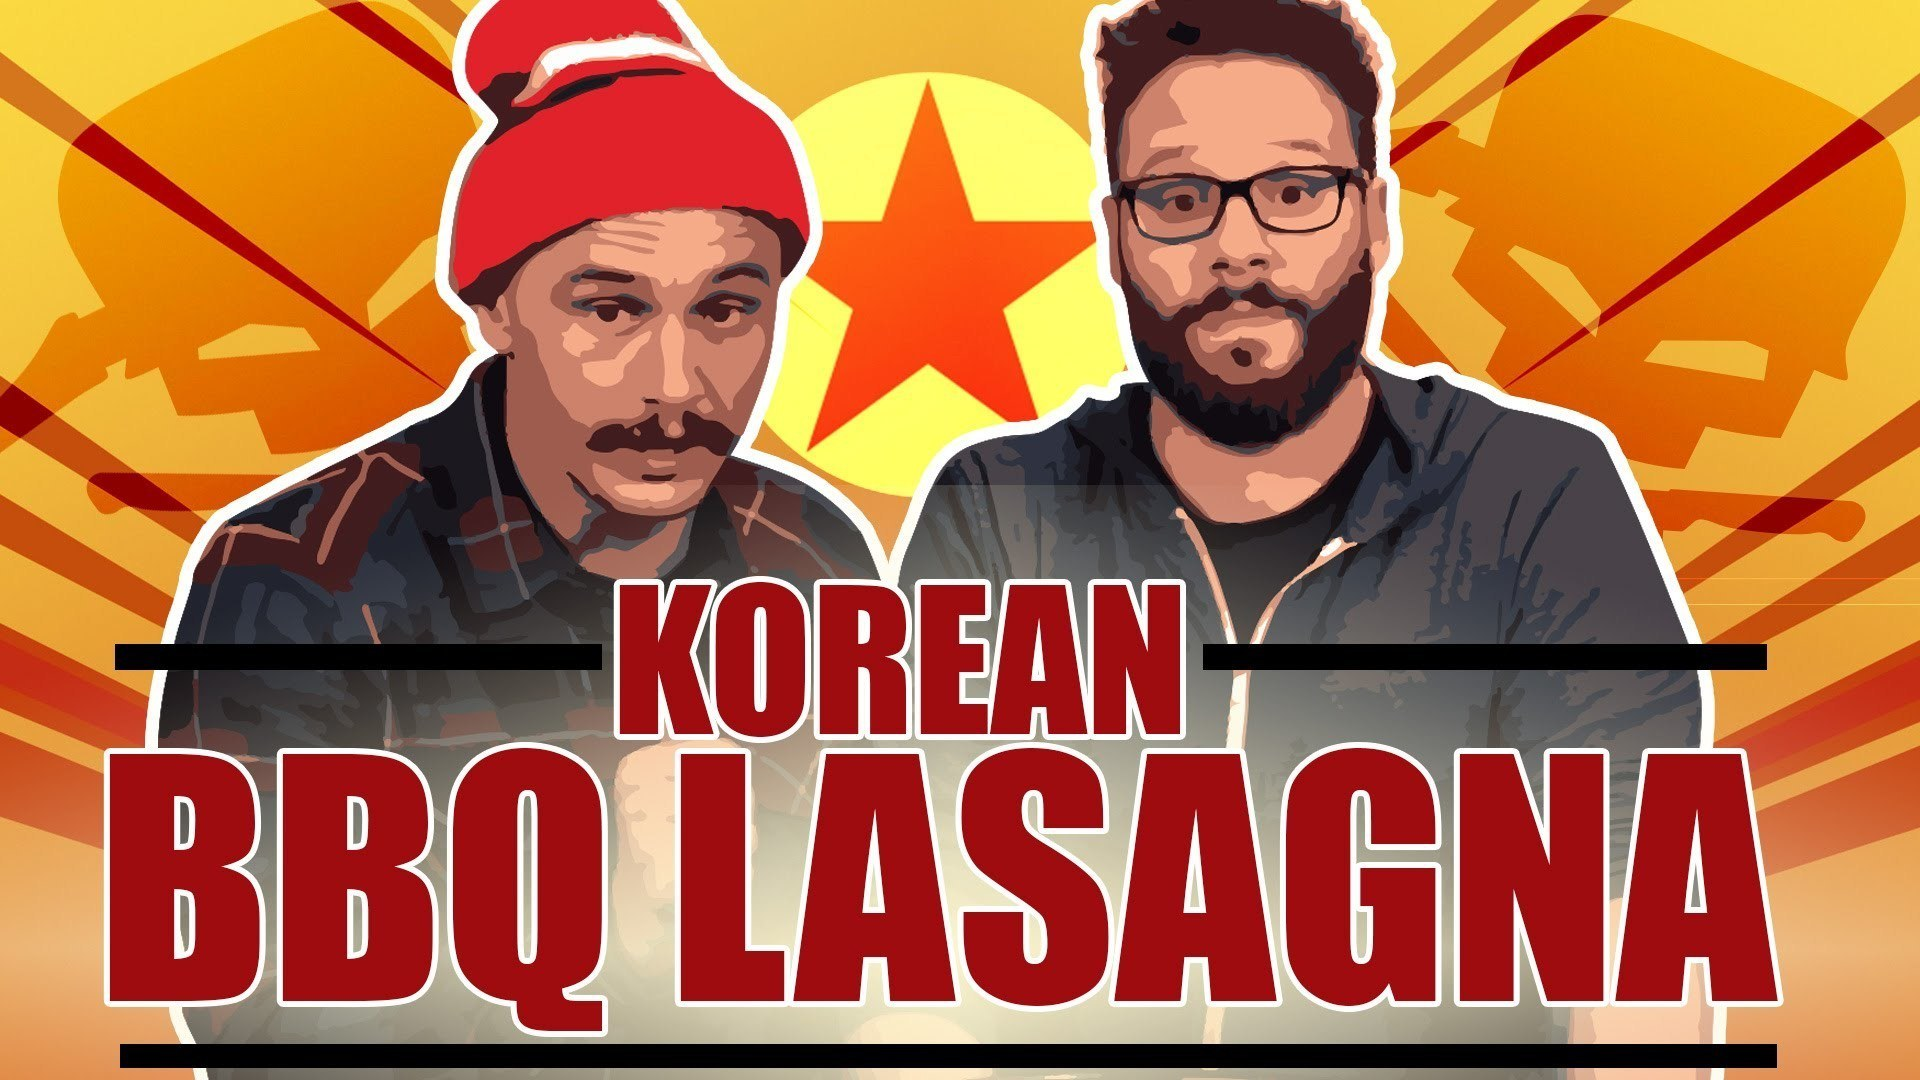 Watch Seth Rogen And James Franco Make a 33,000 Calorie Lasagna